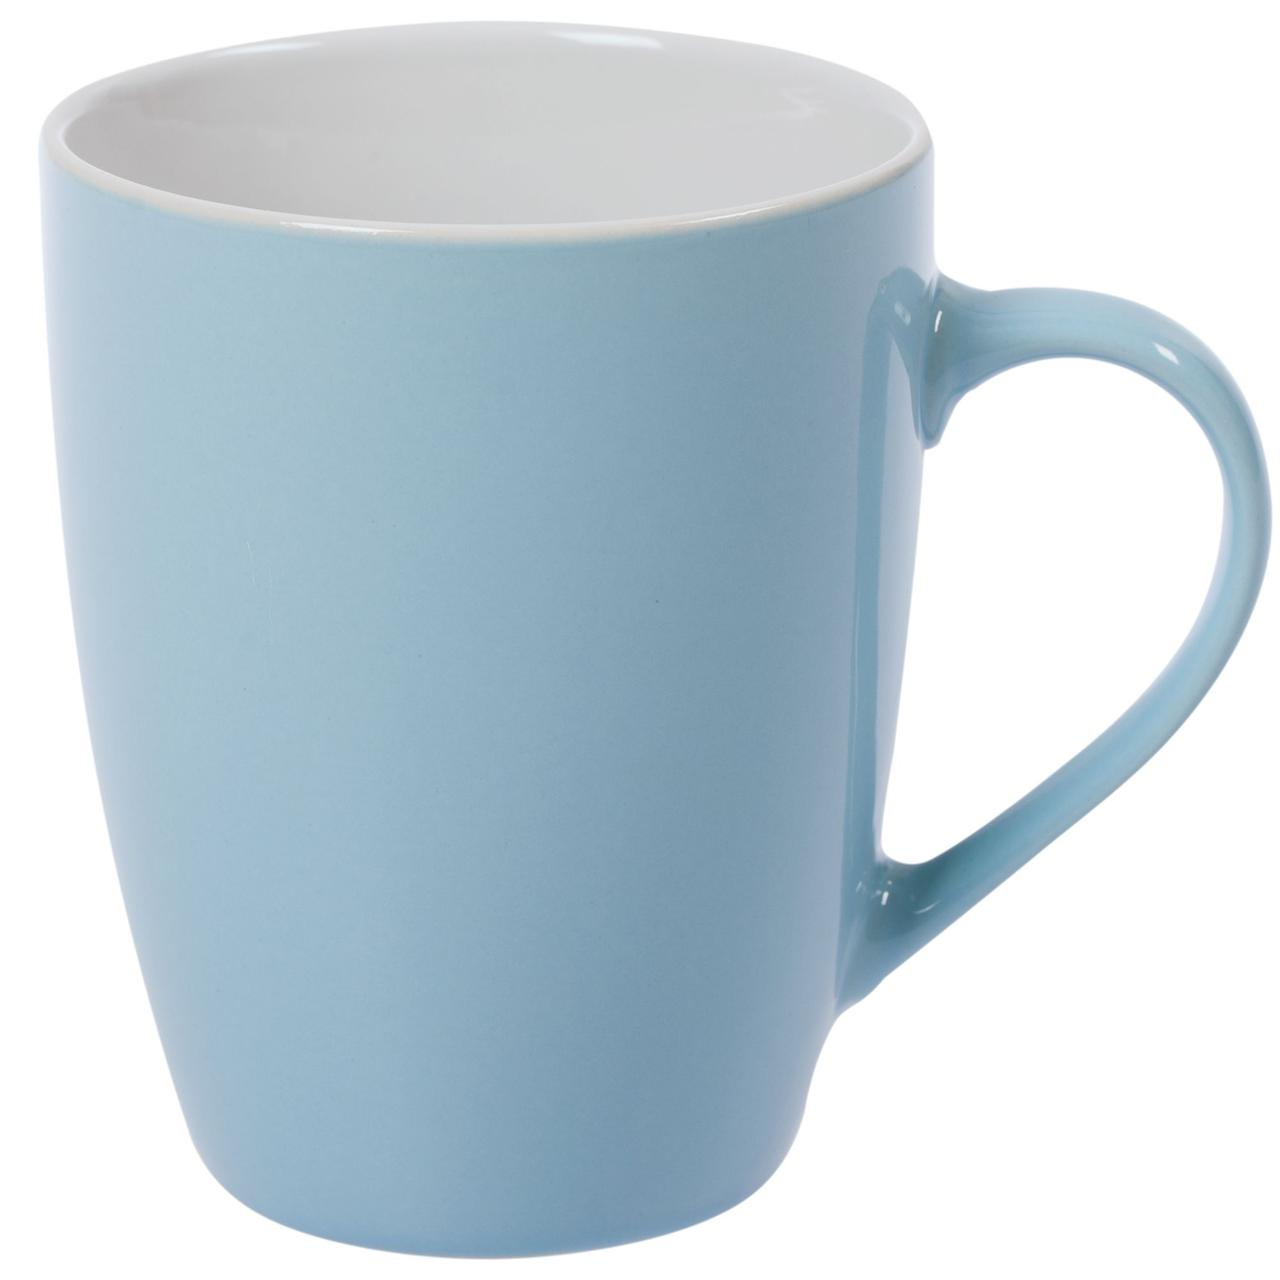 Кружка Good Morning, голубая (артикул 6478.14)